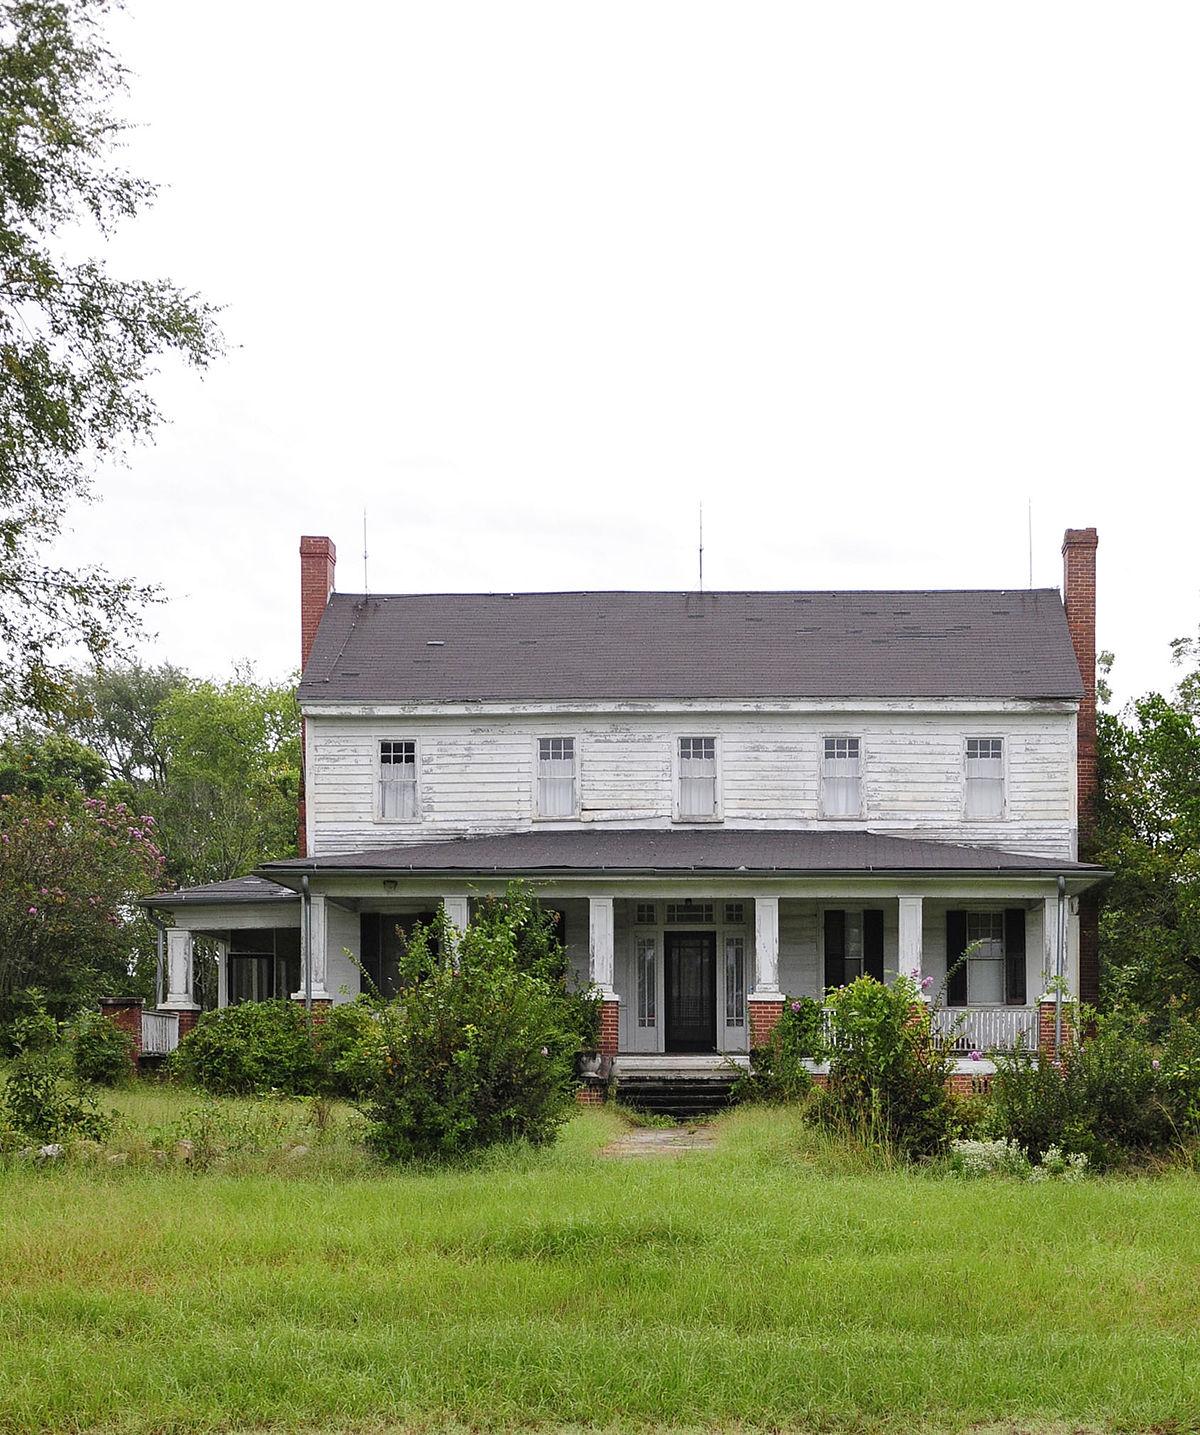 webb-coleman house